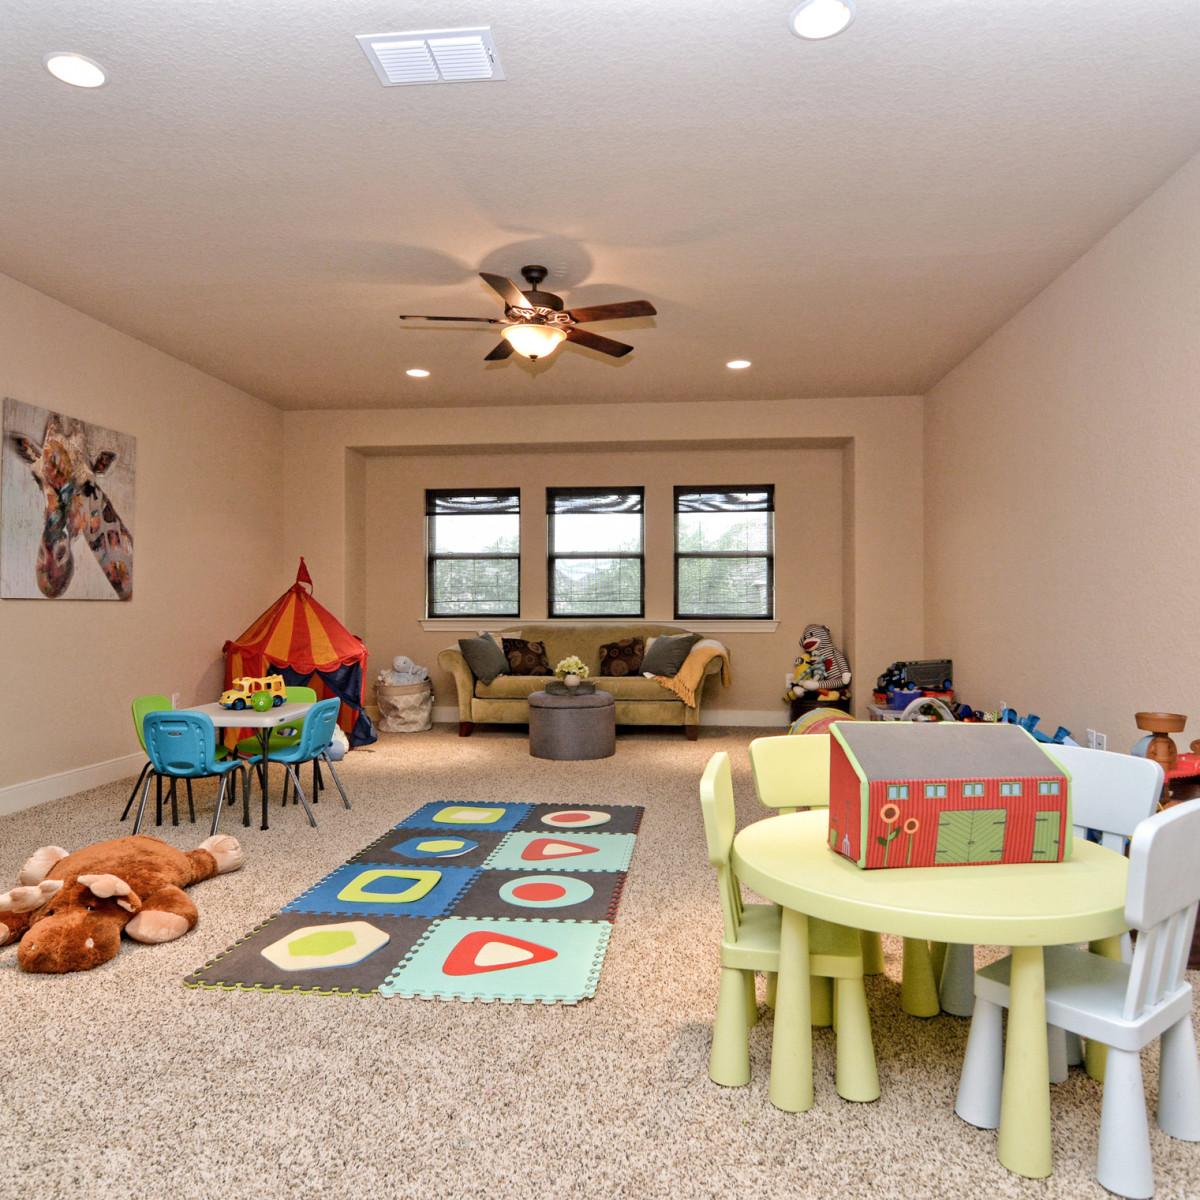 24323 Arboles Verdes San Antonio house for sale playroom